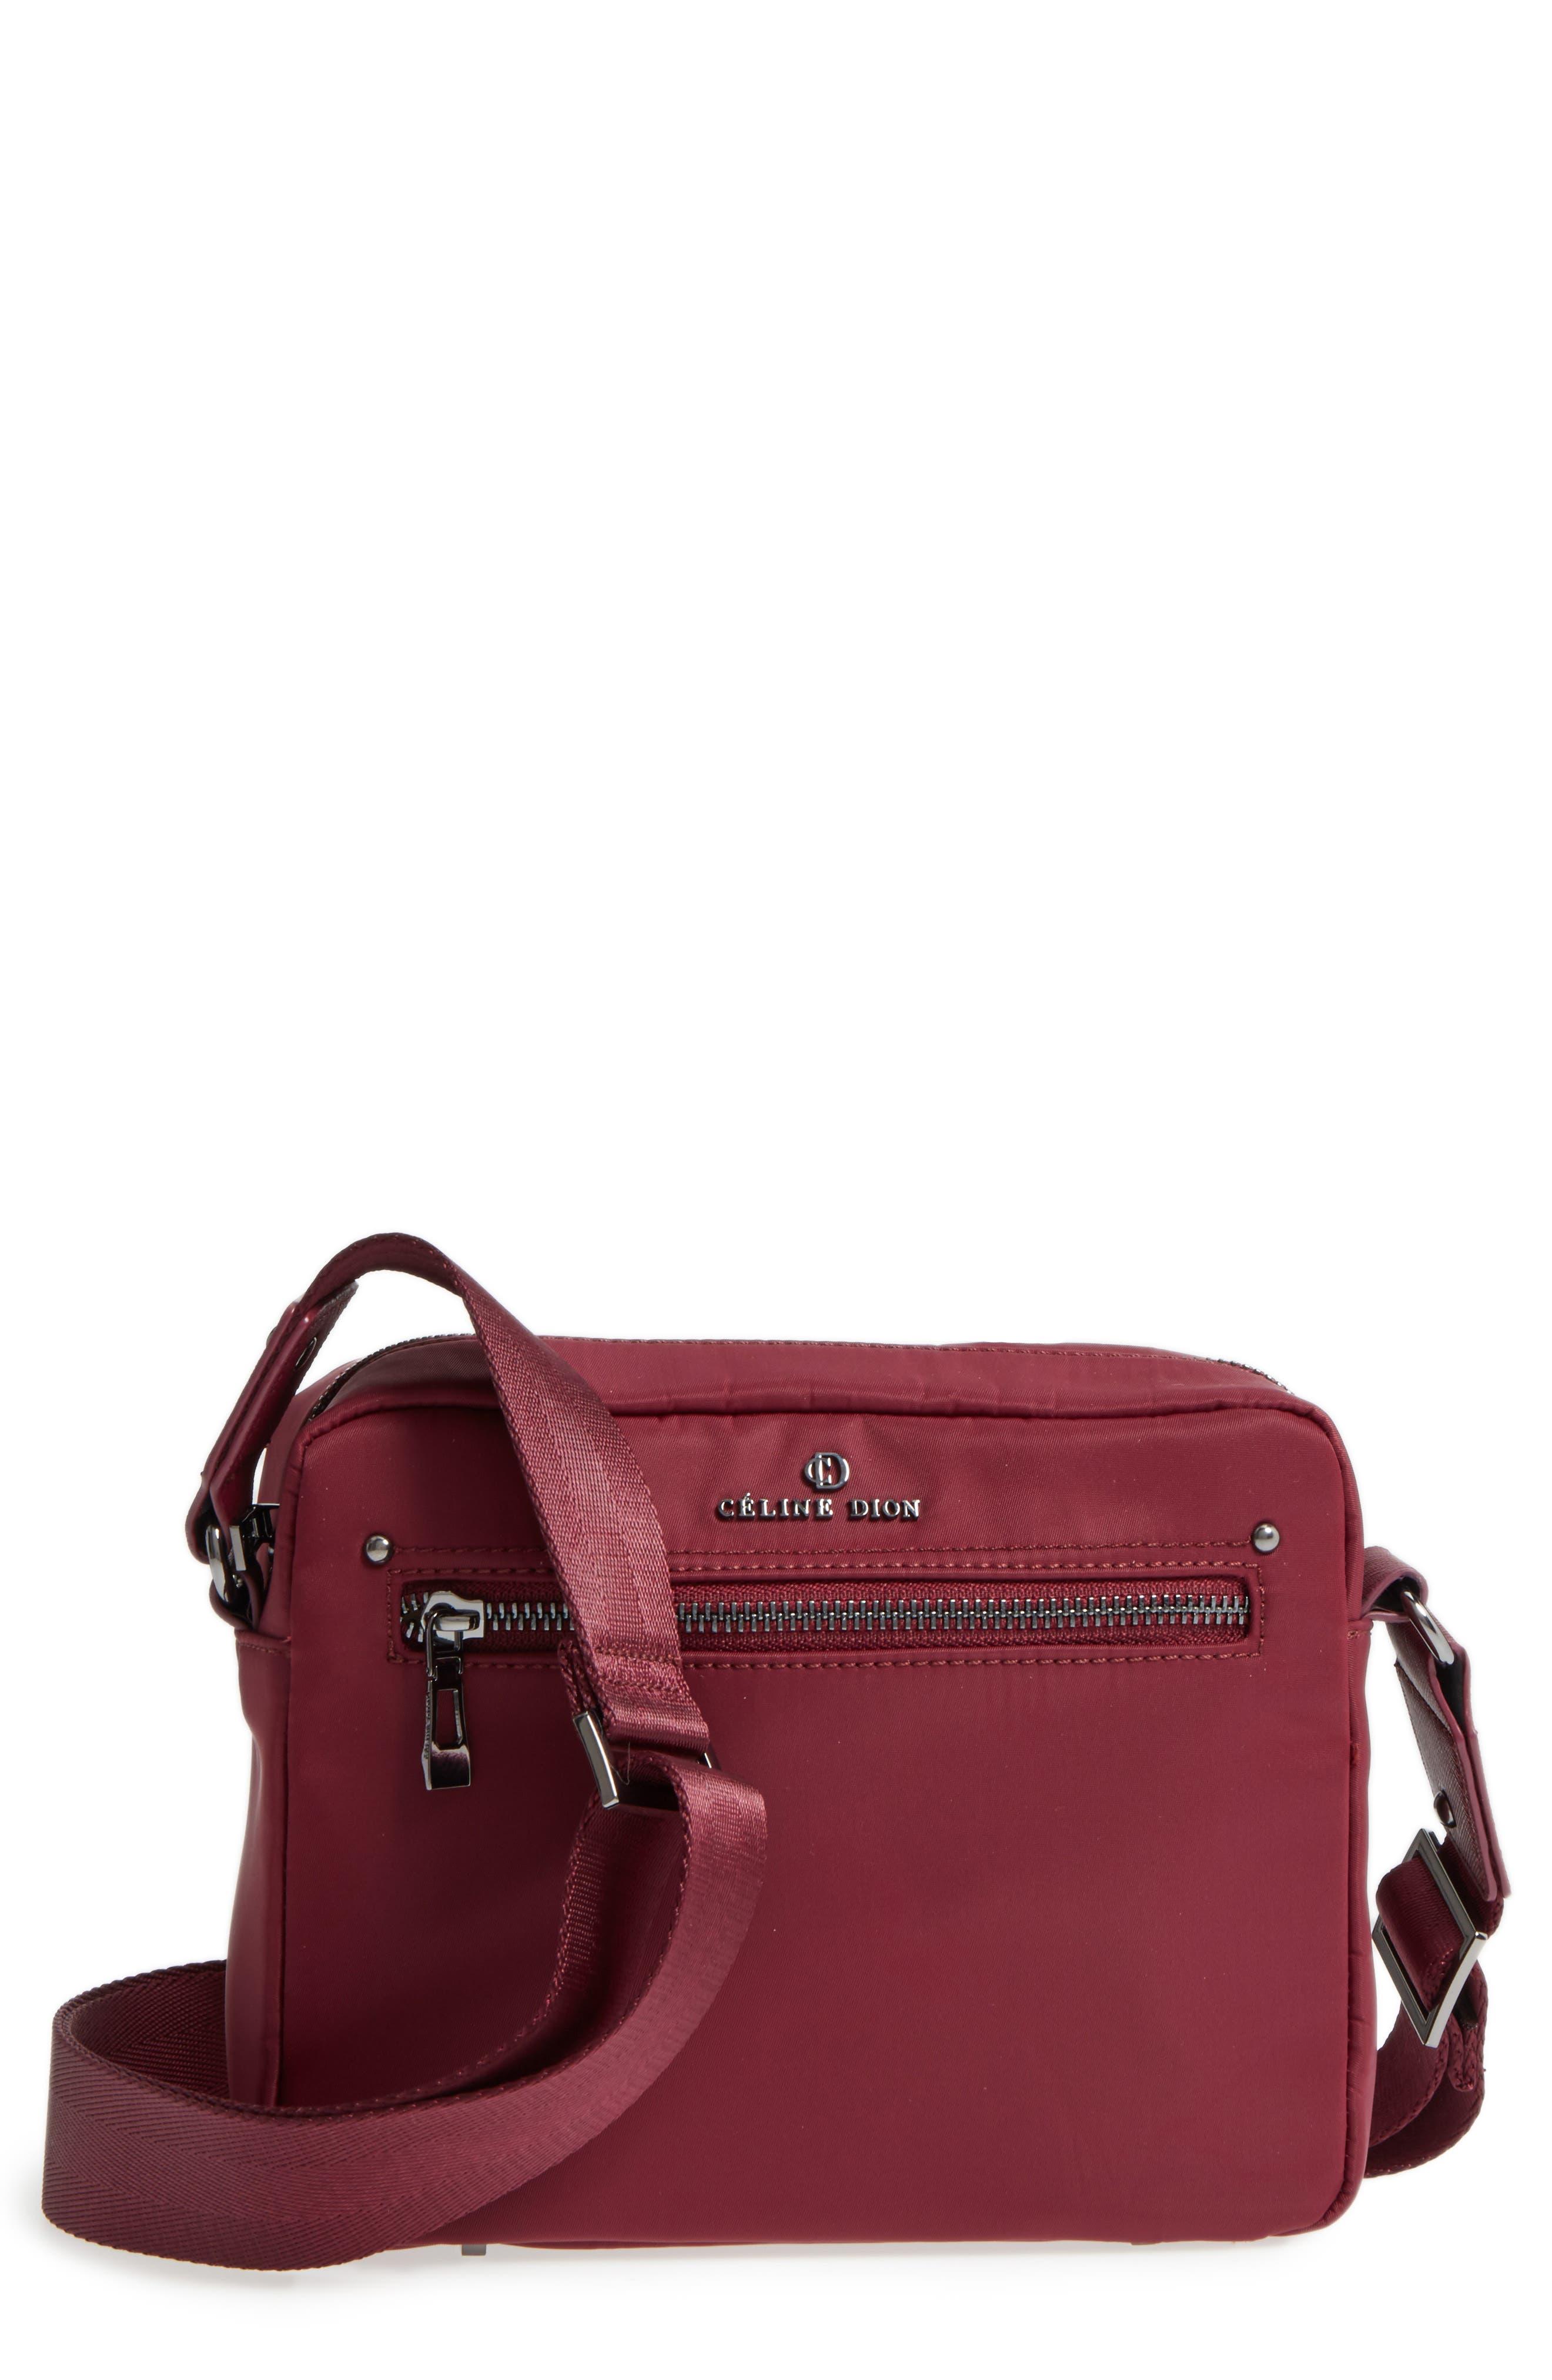 Céline Dion Presto Nylon Crossbody Bag